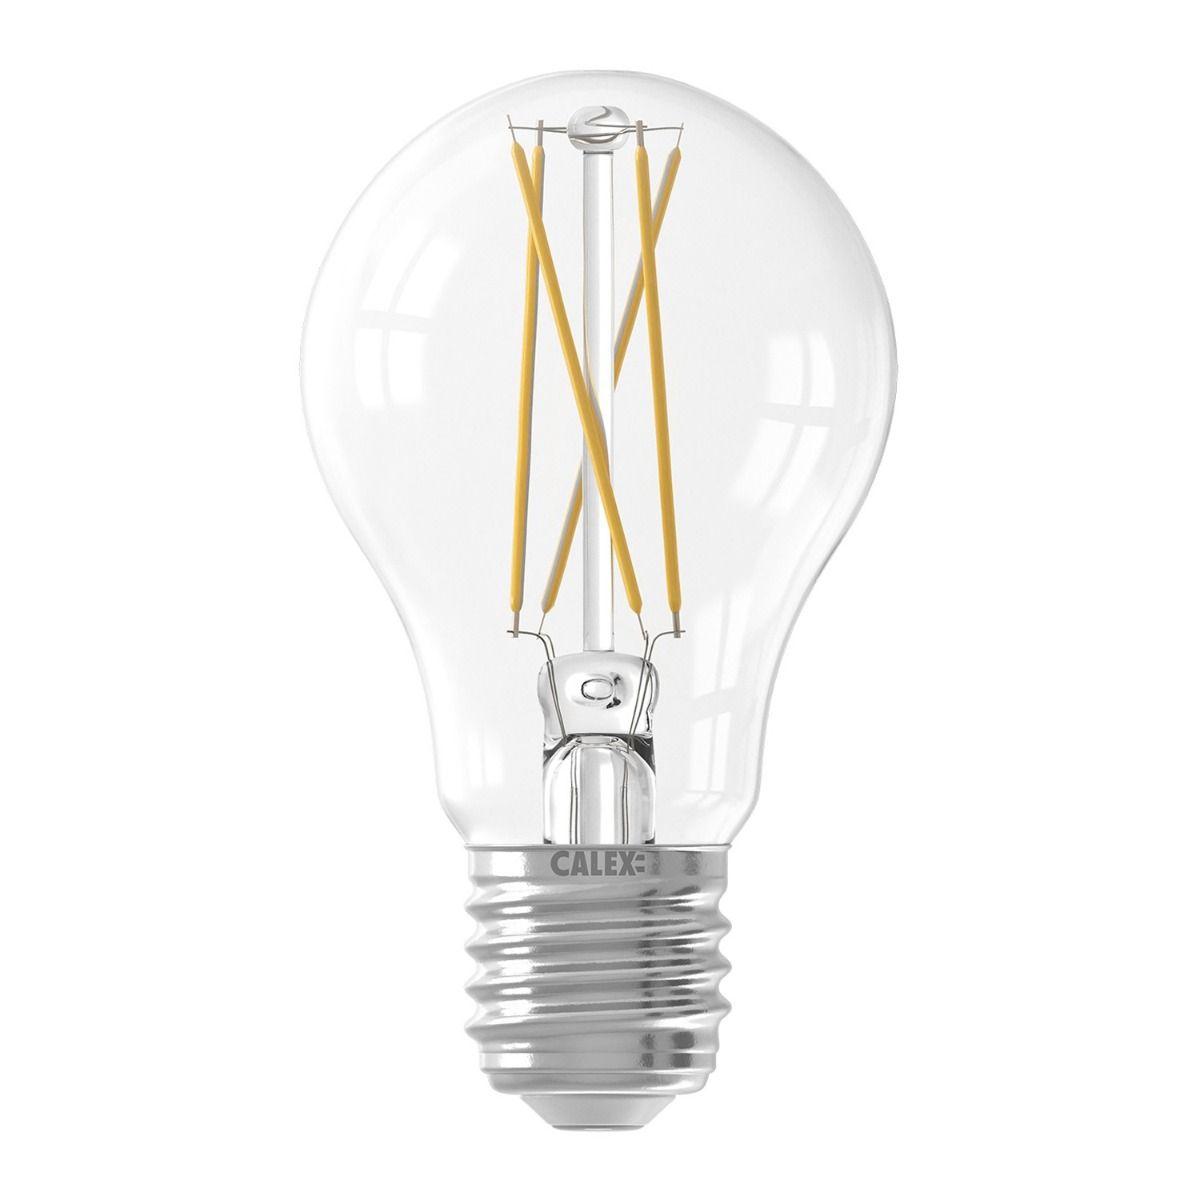 Calex Smart Standard LED Glühbirne E27 7W 806lm 1800-3000K Fadenlampe | Tuya Wifi